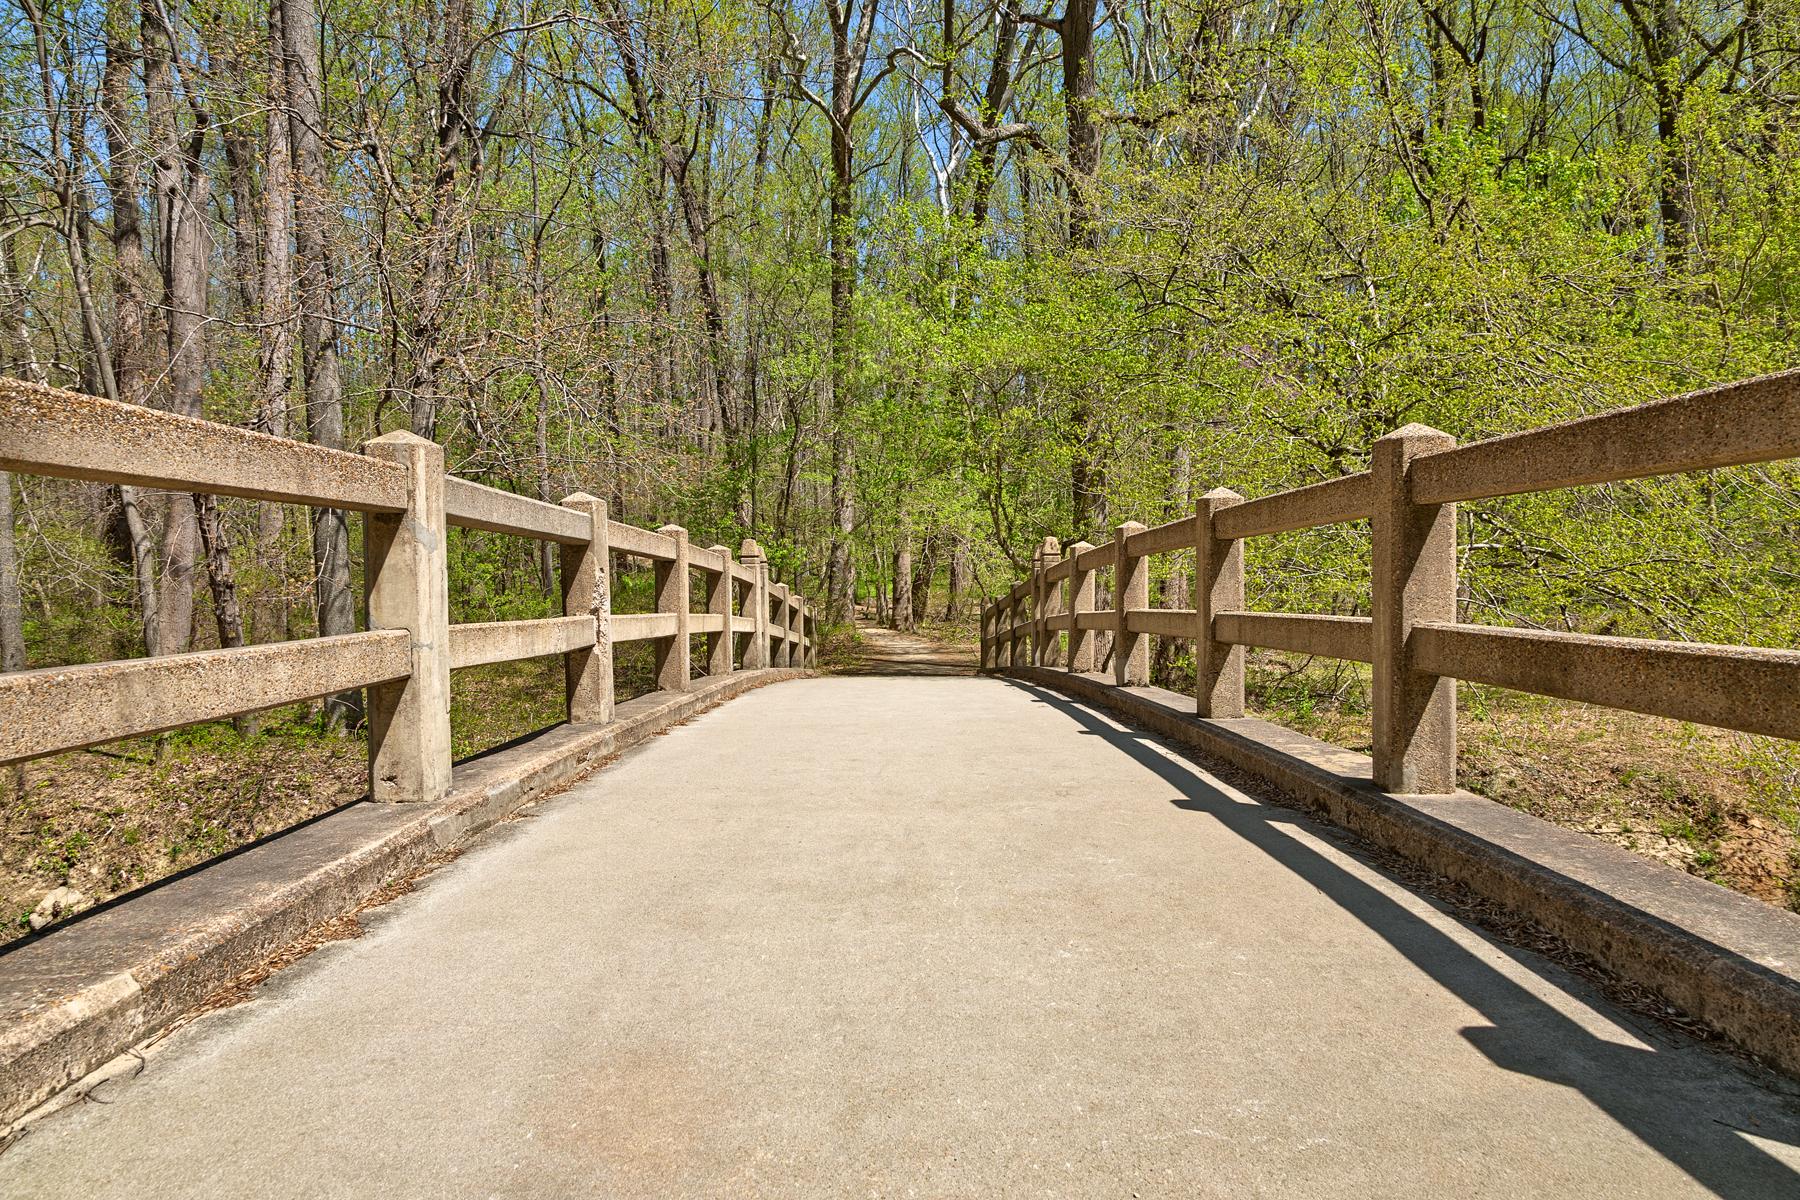 Bridge to Spring - HDR, America, Rock, Sky, Shadows, HQ Photo